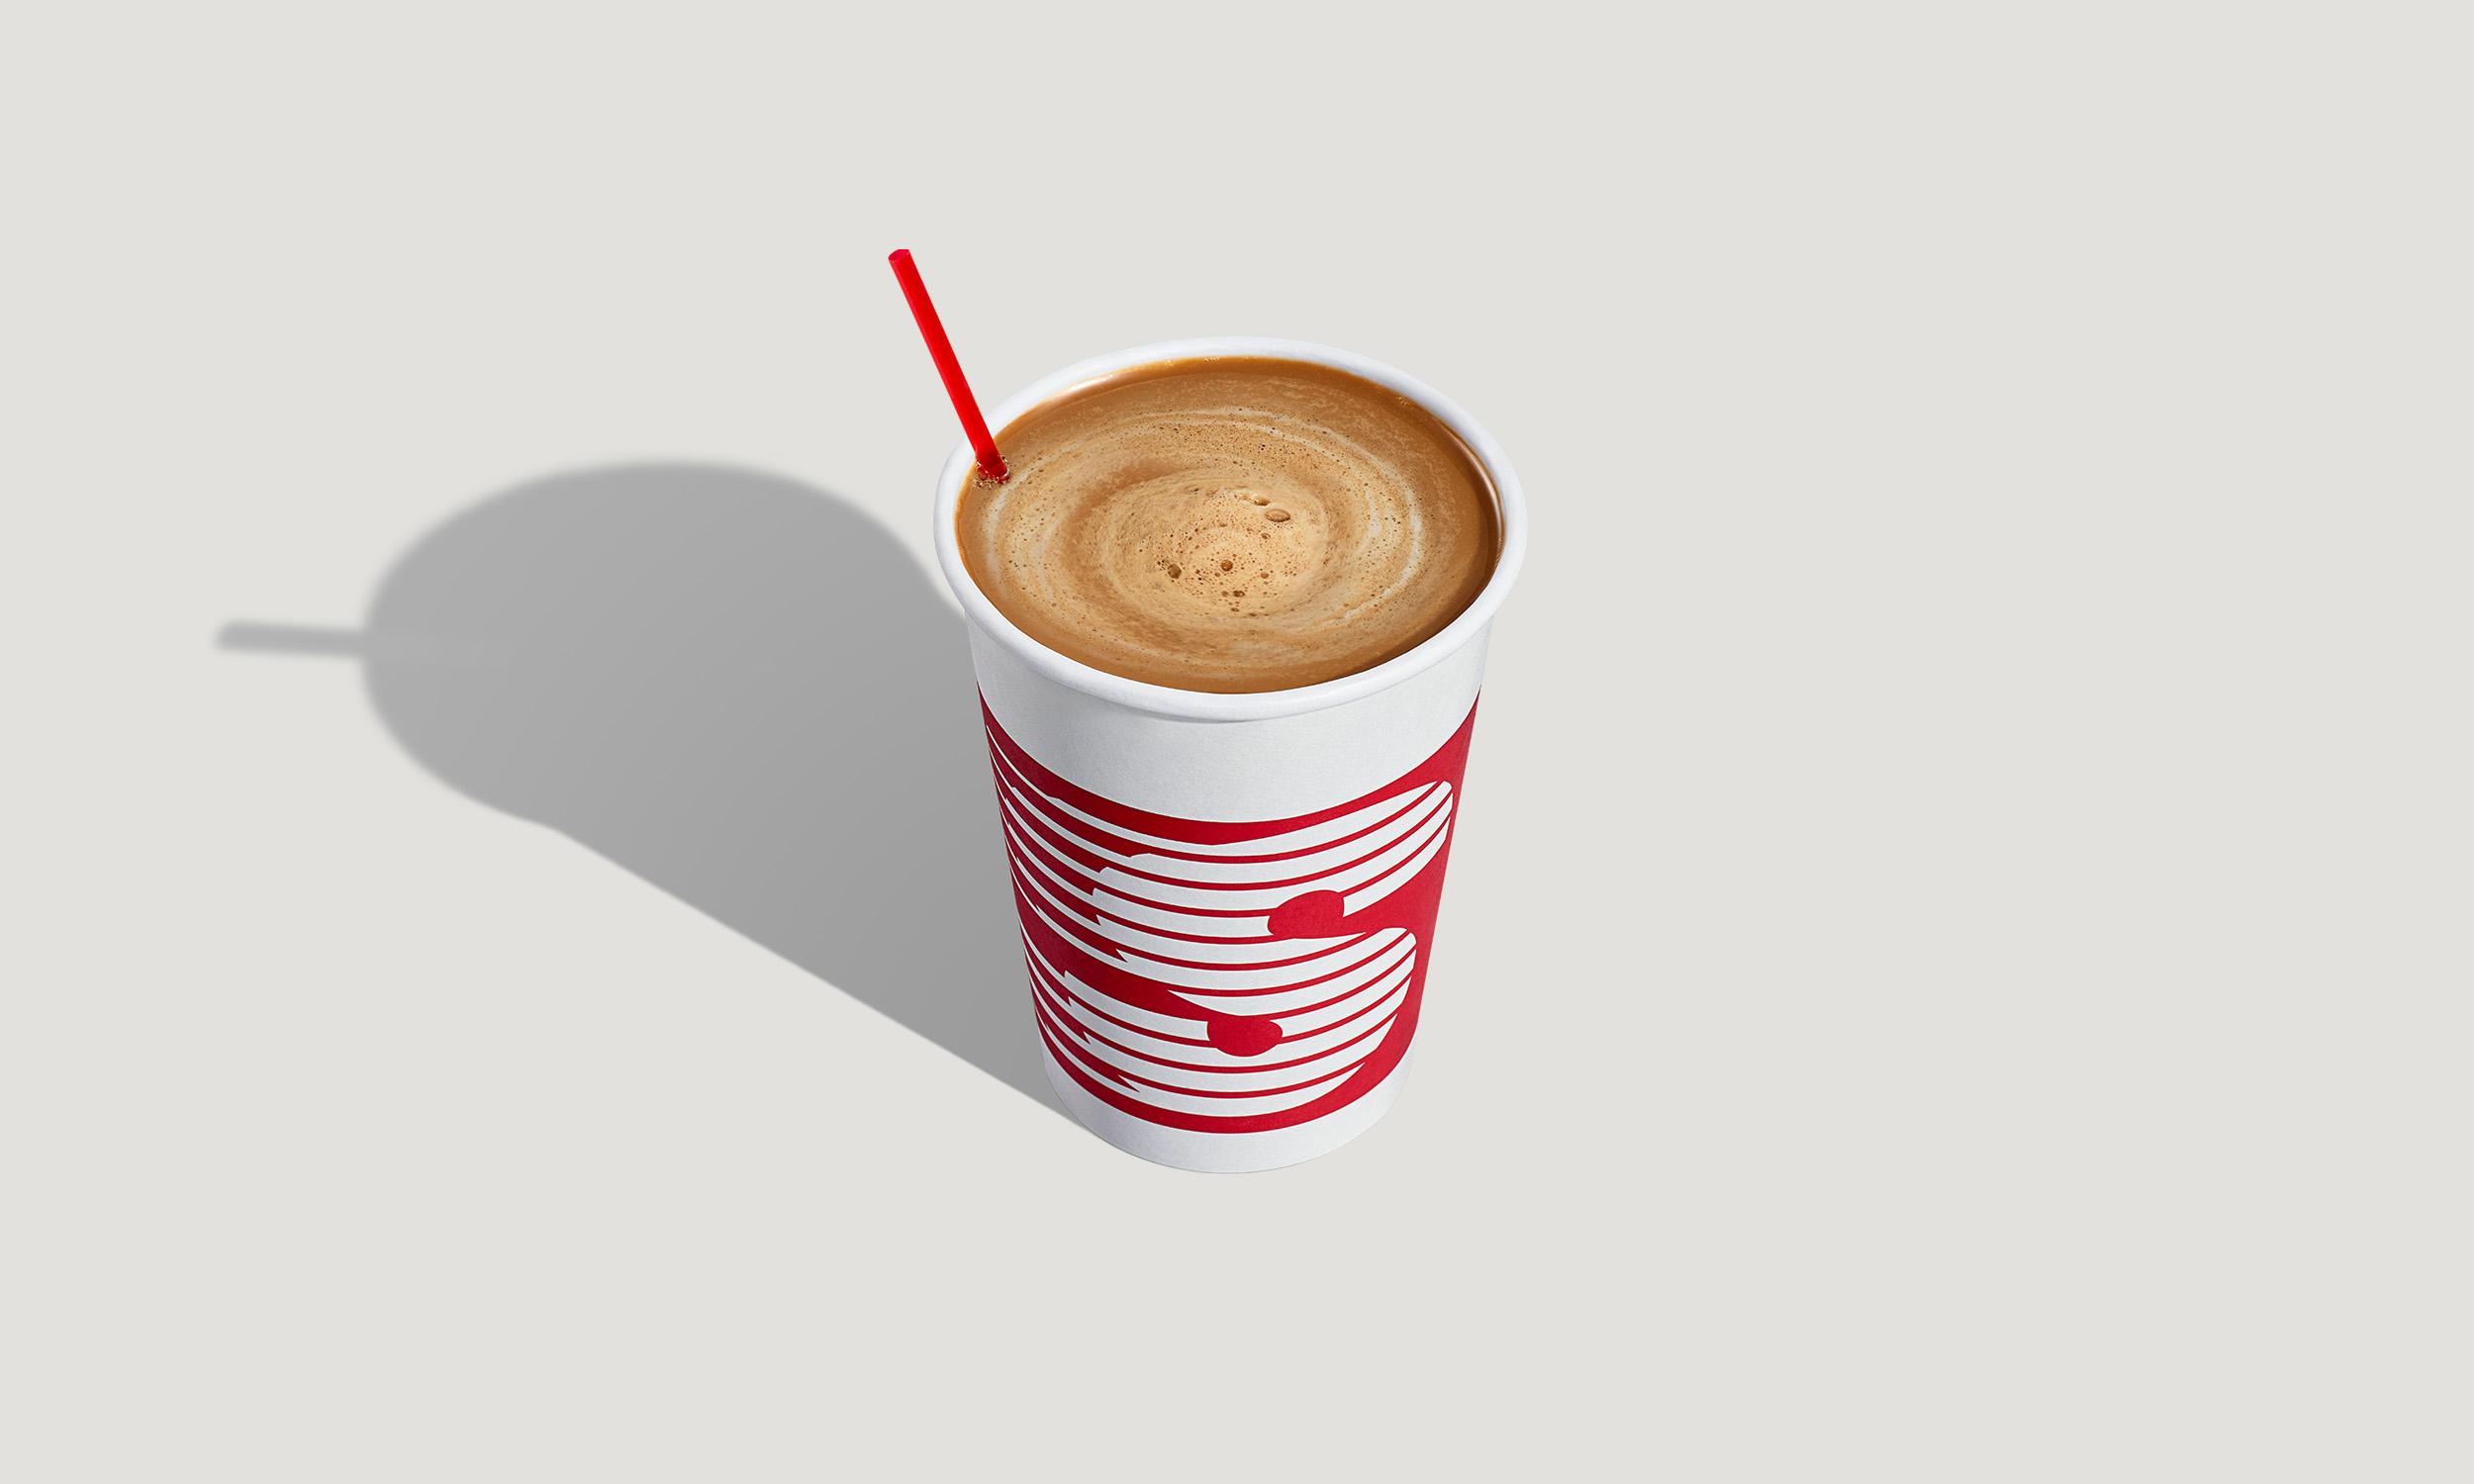 Speedway_IsometricProductPhotography_Coffee-Hero.jpg